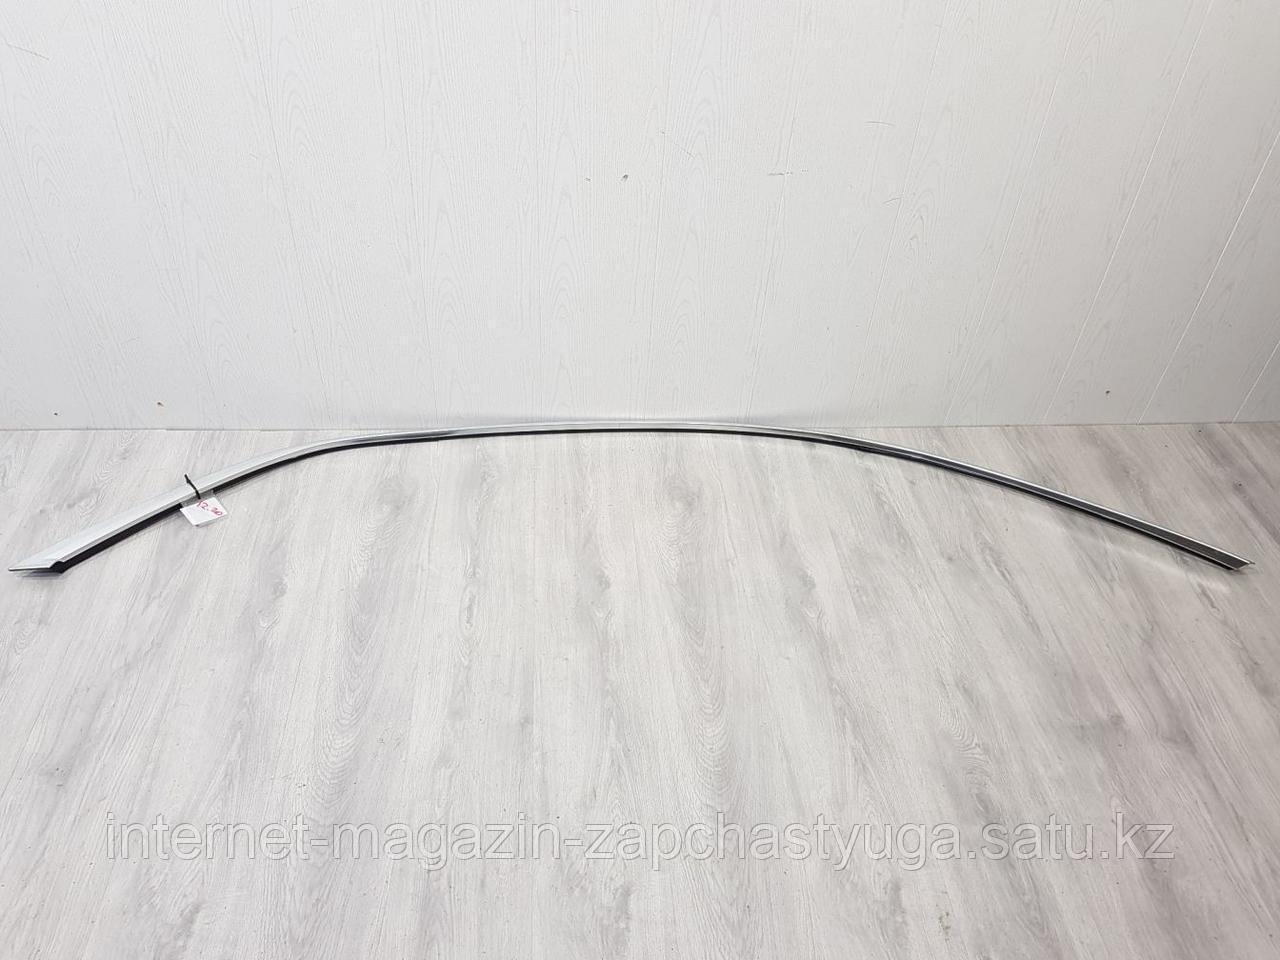 22744644 Молдинг кузова правый для Cadillac CTS 2013- Б/У - фото 4